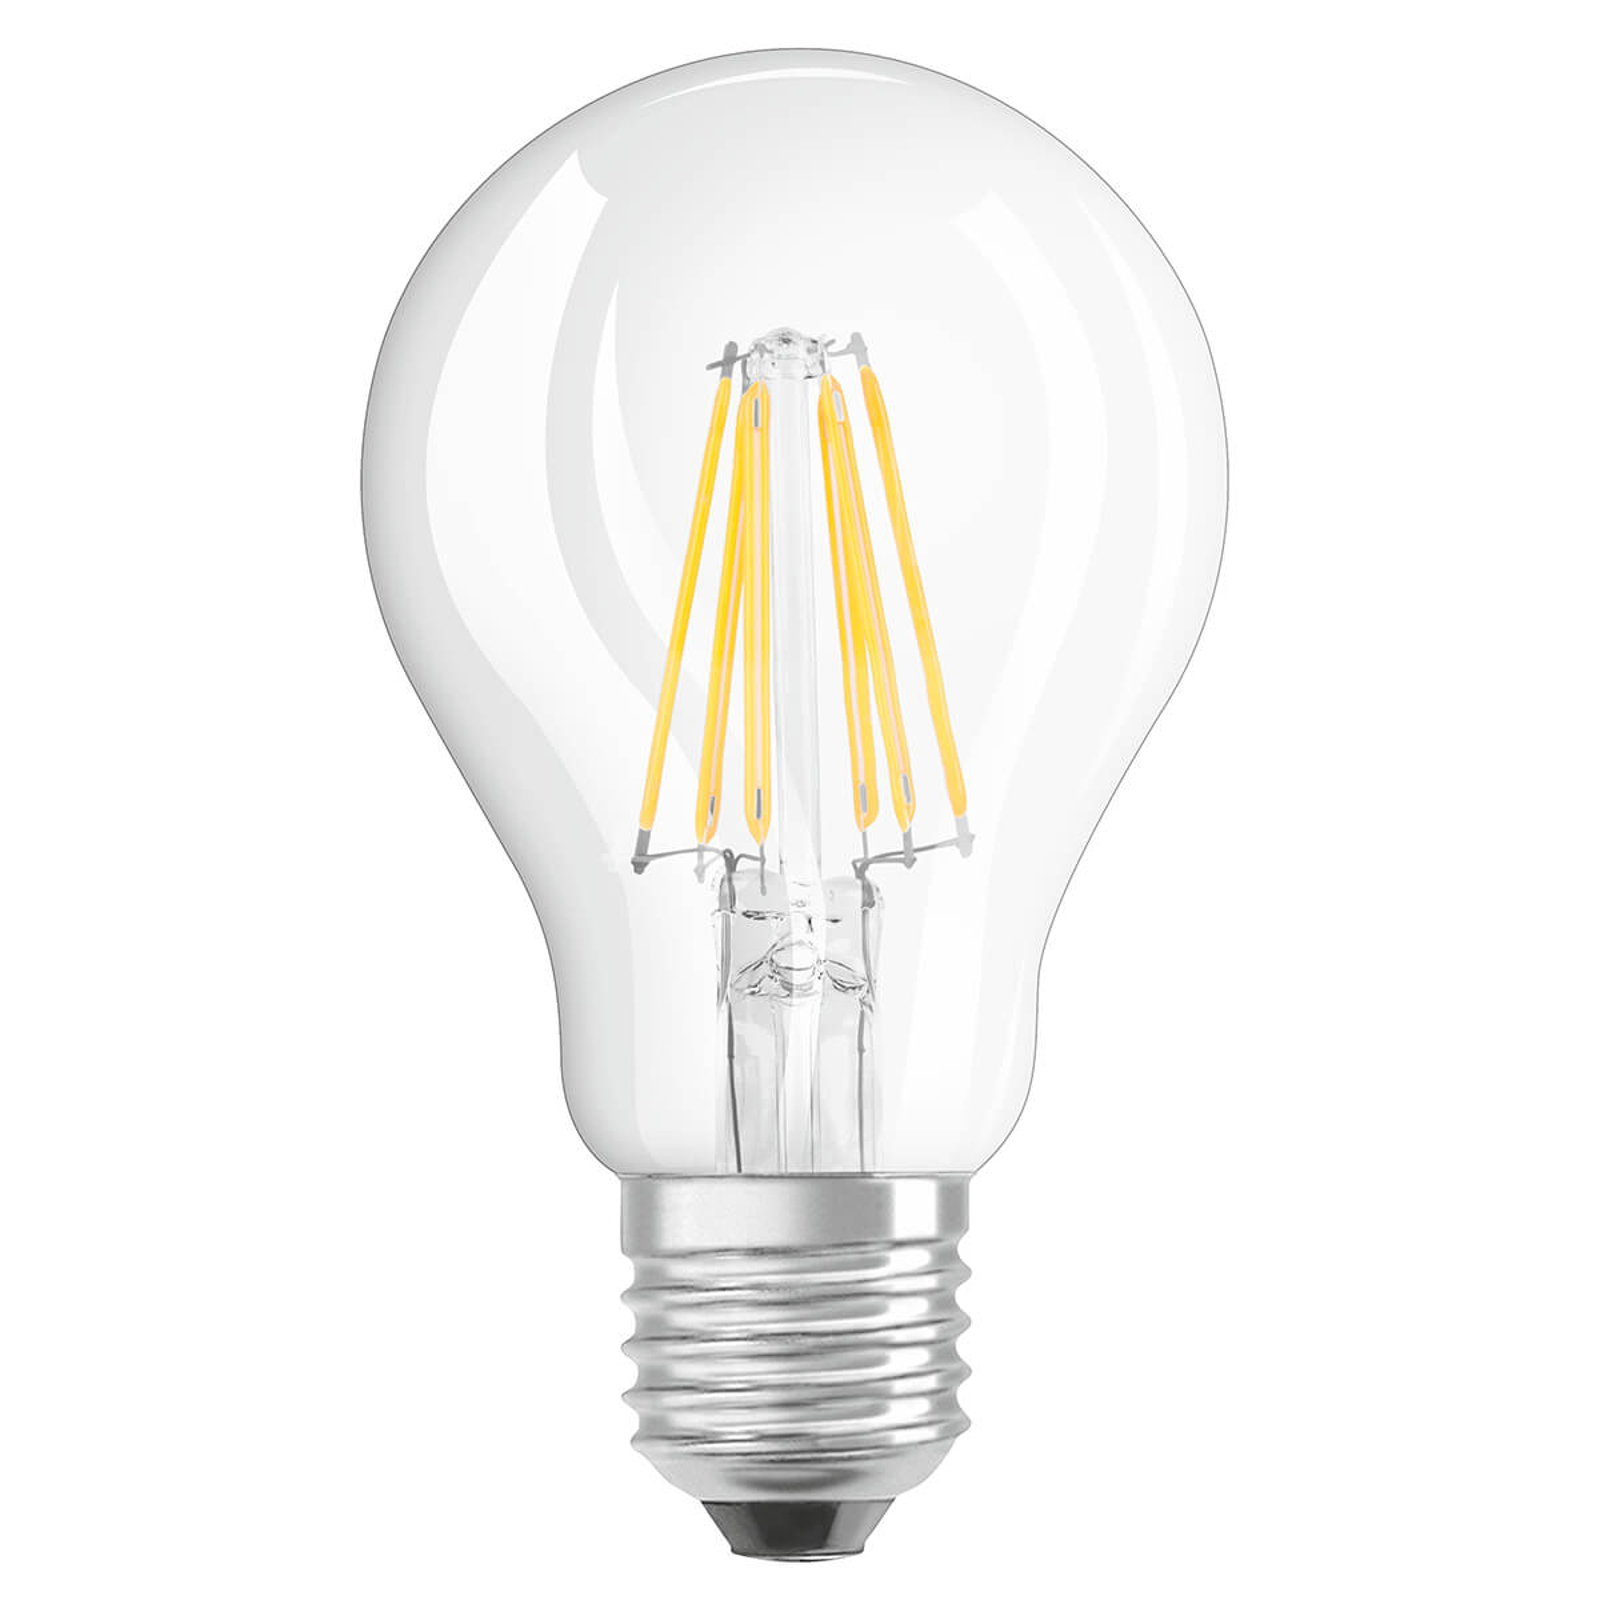 OSRAM-LED-lamppu E27 7W GLOWdim kirkas